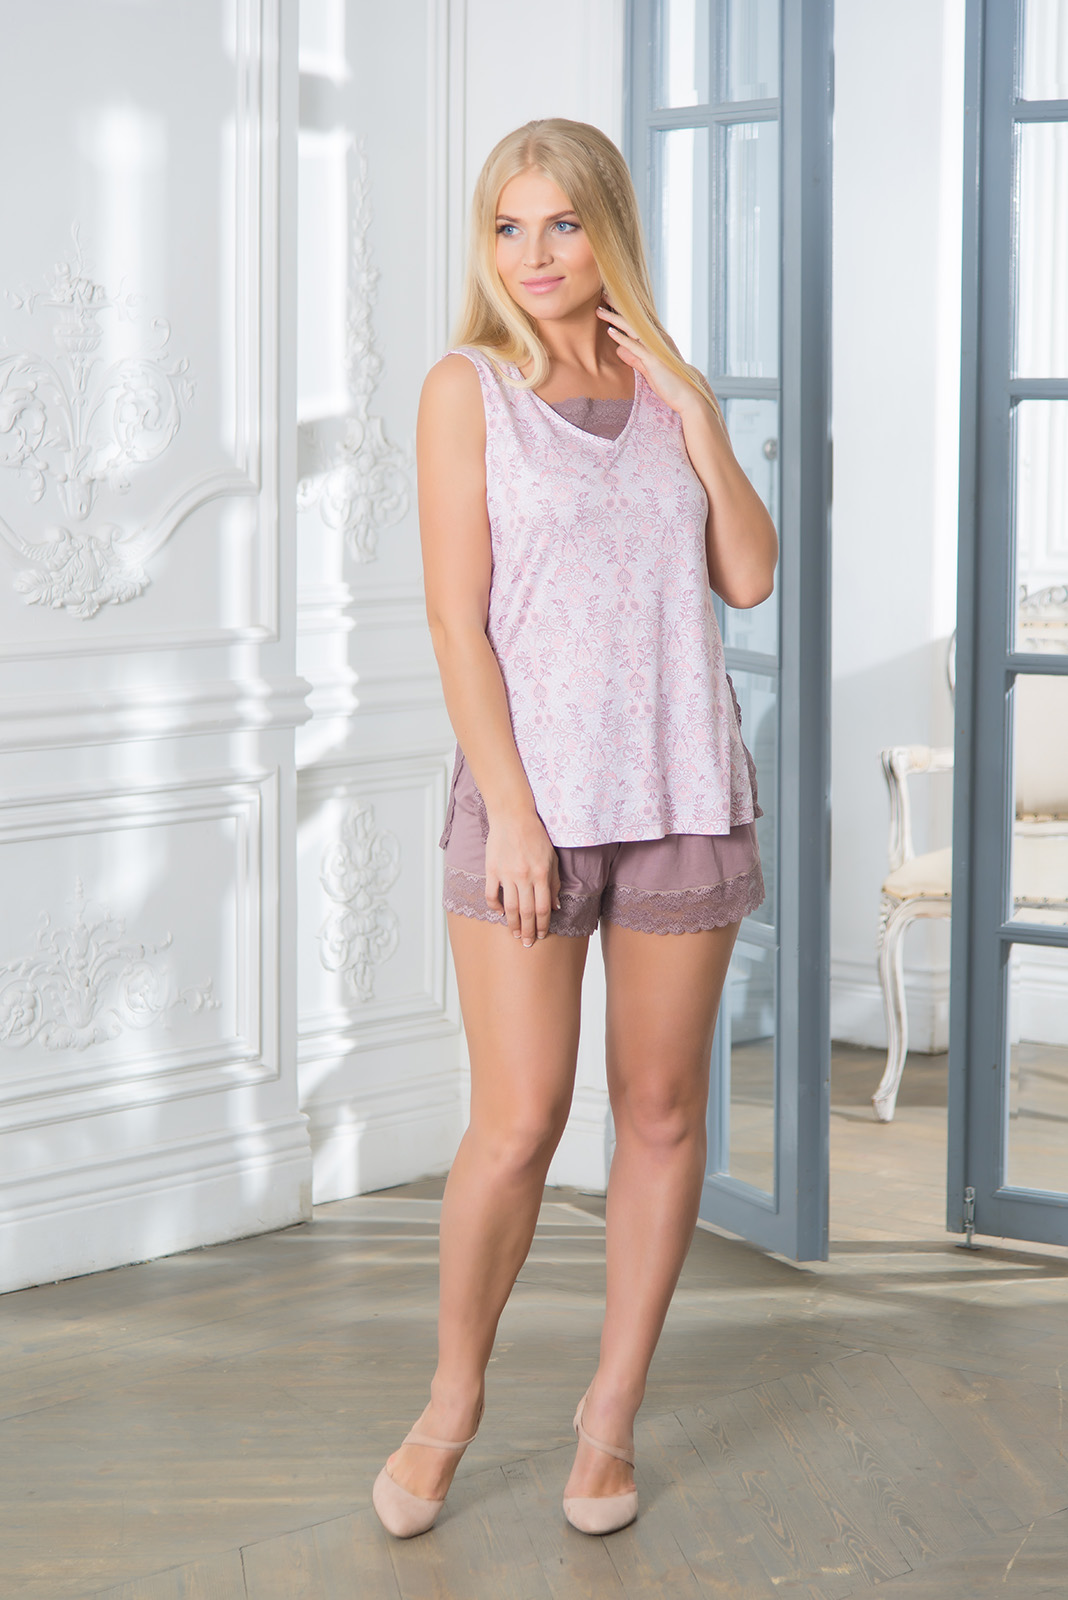 Пижамы Mia Cara Пижама Paulina Цвет: Сиреневый (xxL) пижамы mia cara пижама paisley цвет розовый m l